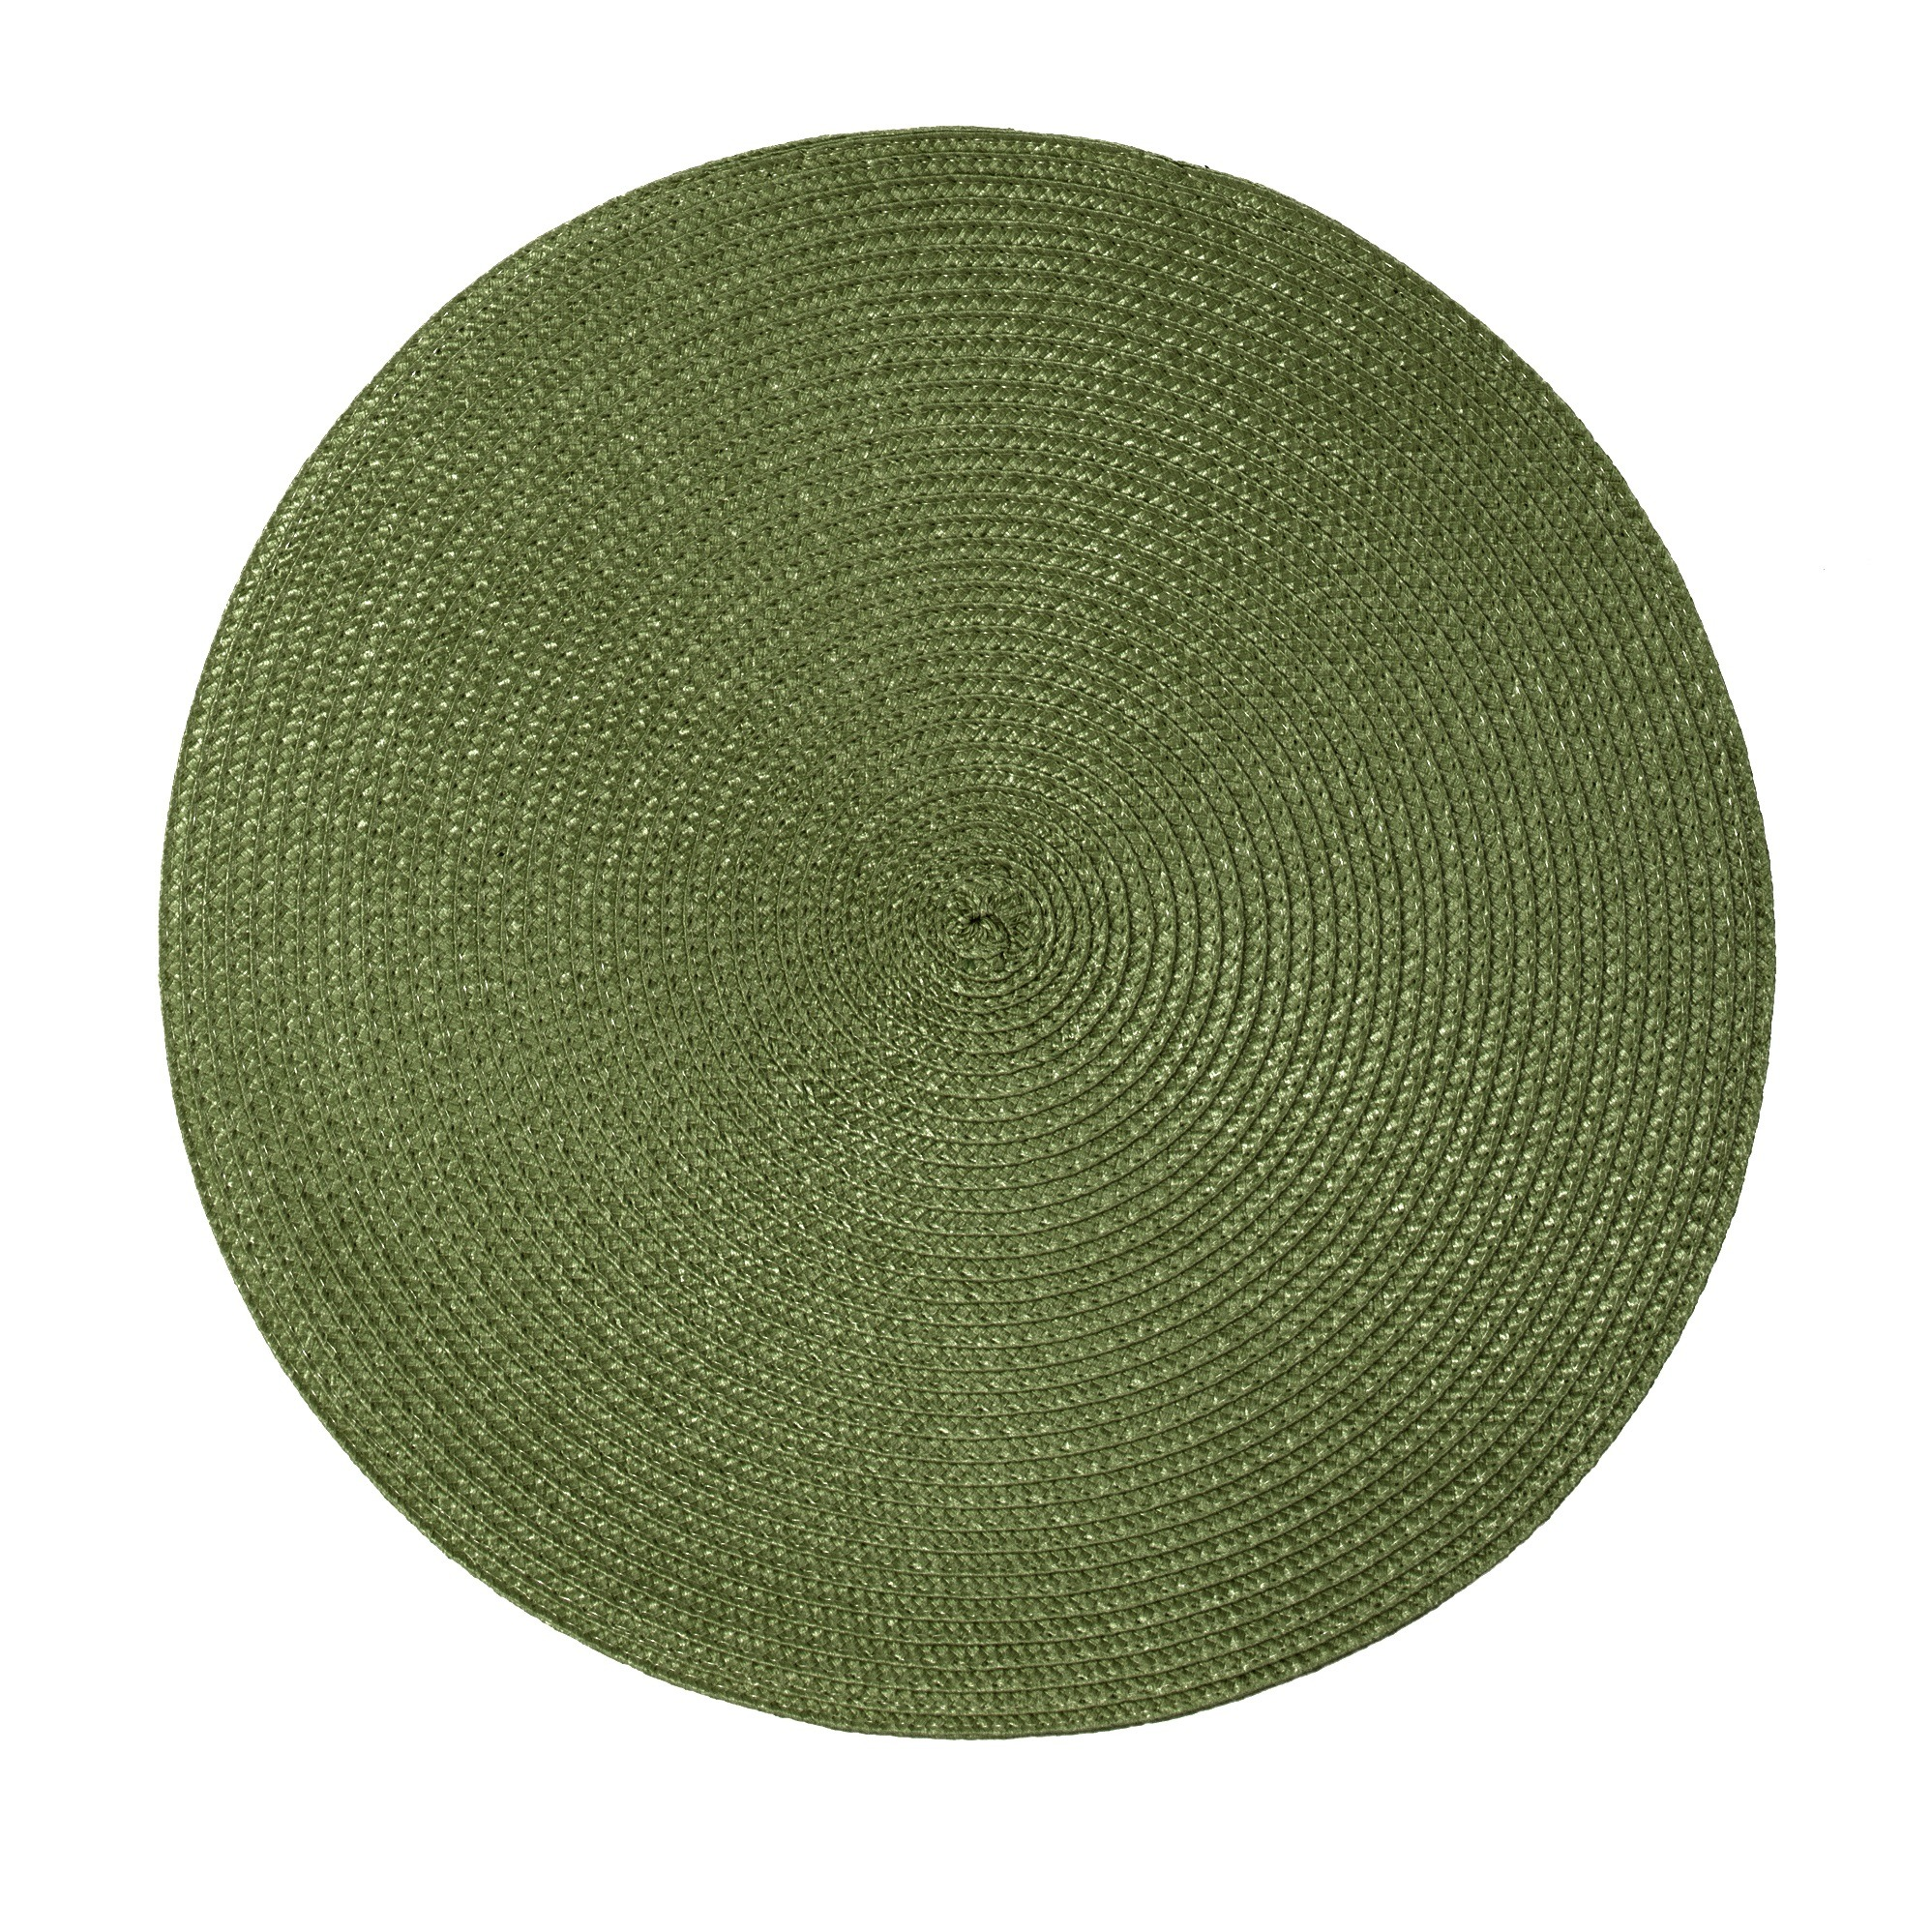 Pano Americano Redondo Verde 38 cm Polpropileno 1 Peca - Bianchini